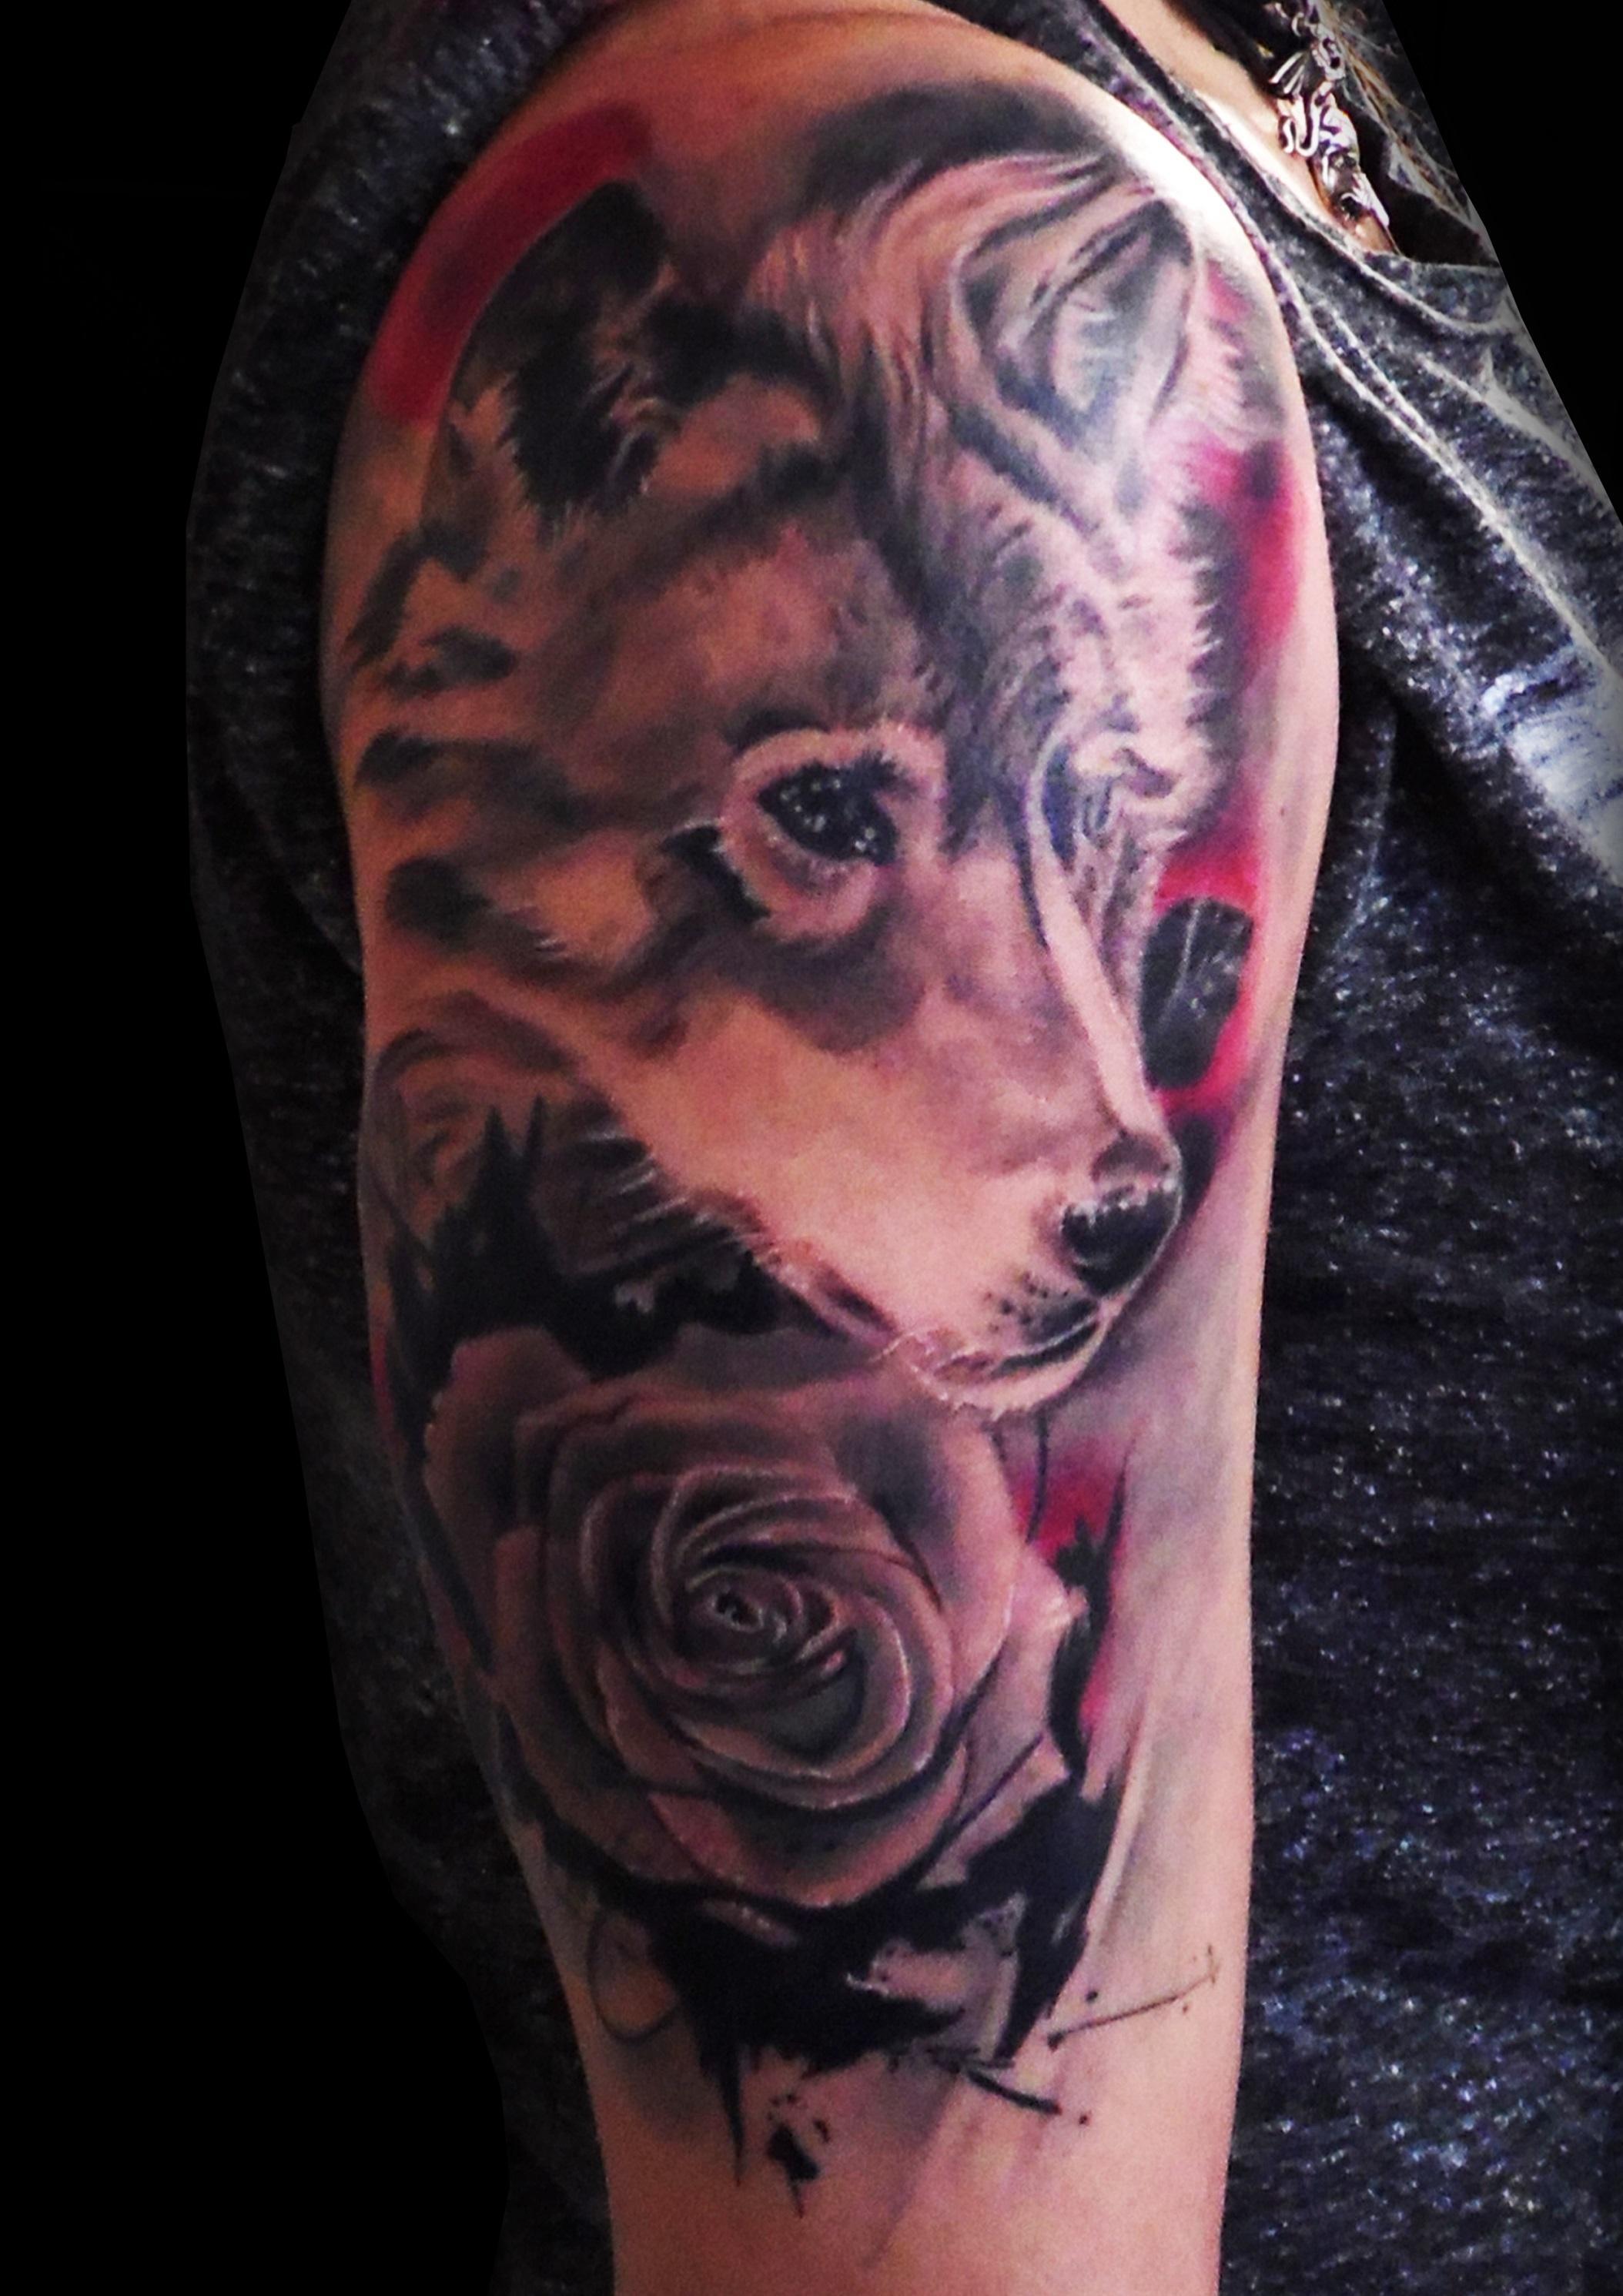 tatuaje lobo realista rosa brazo sombras gris 13depicas